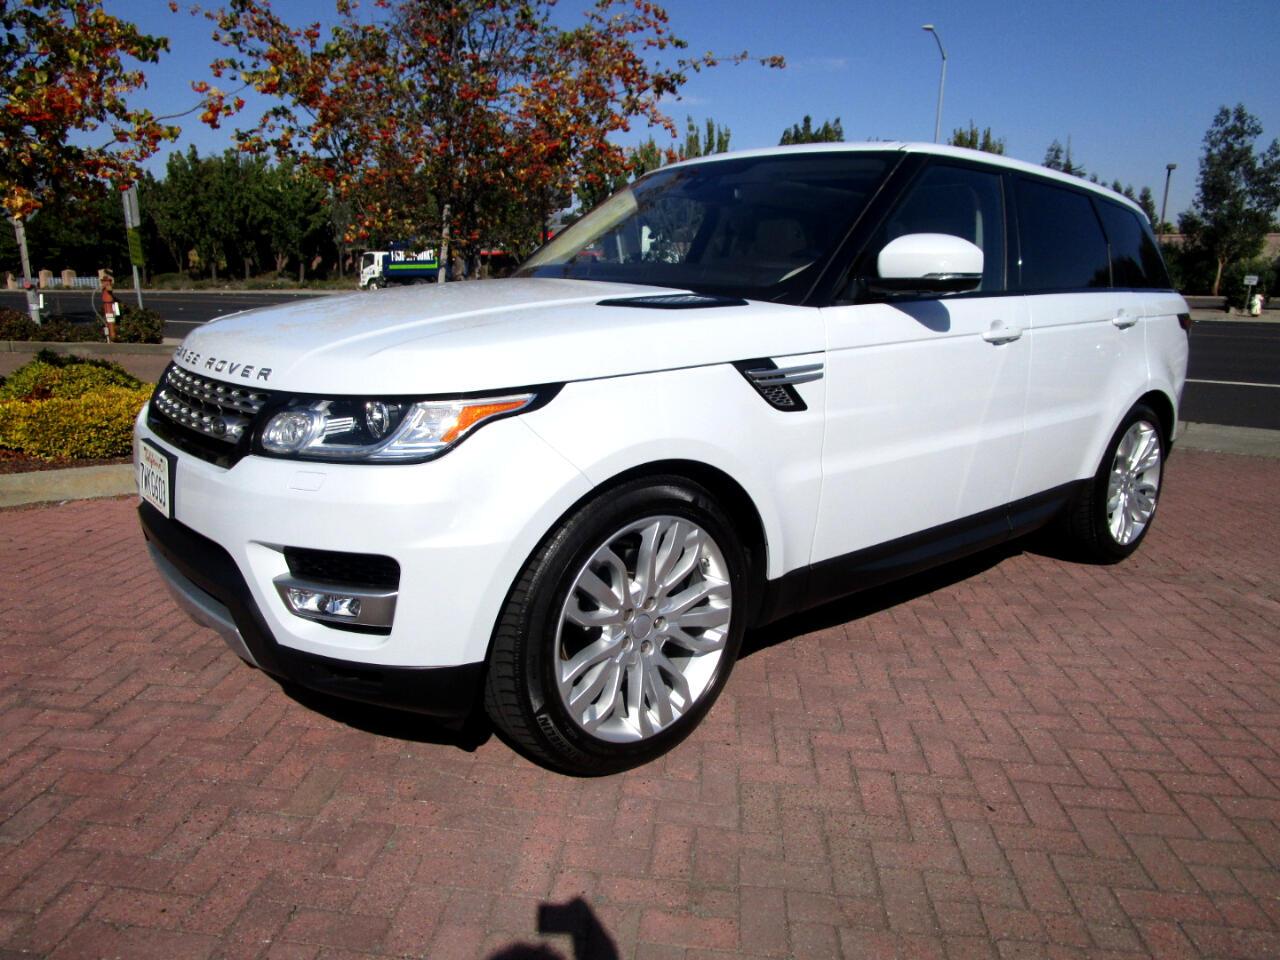 2016 Land Rover Range Rover Sport HSE**PWR 3RD ROW SEAT**HEAT/AC SEATS*REAR HEAT SEA